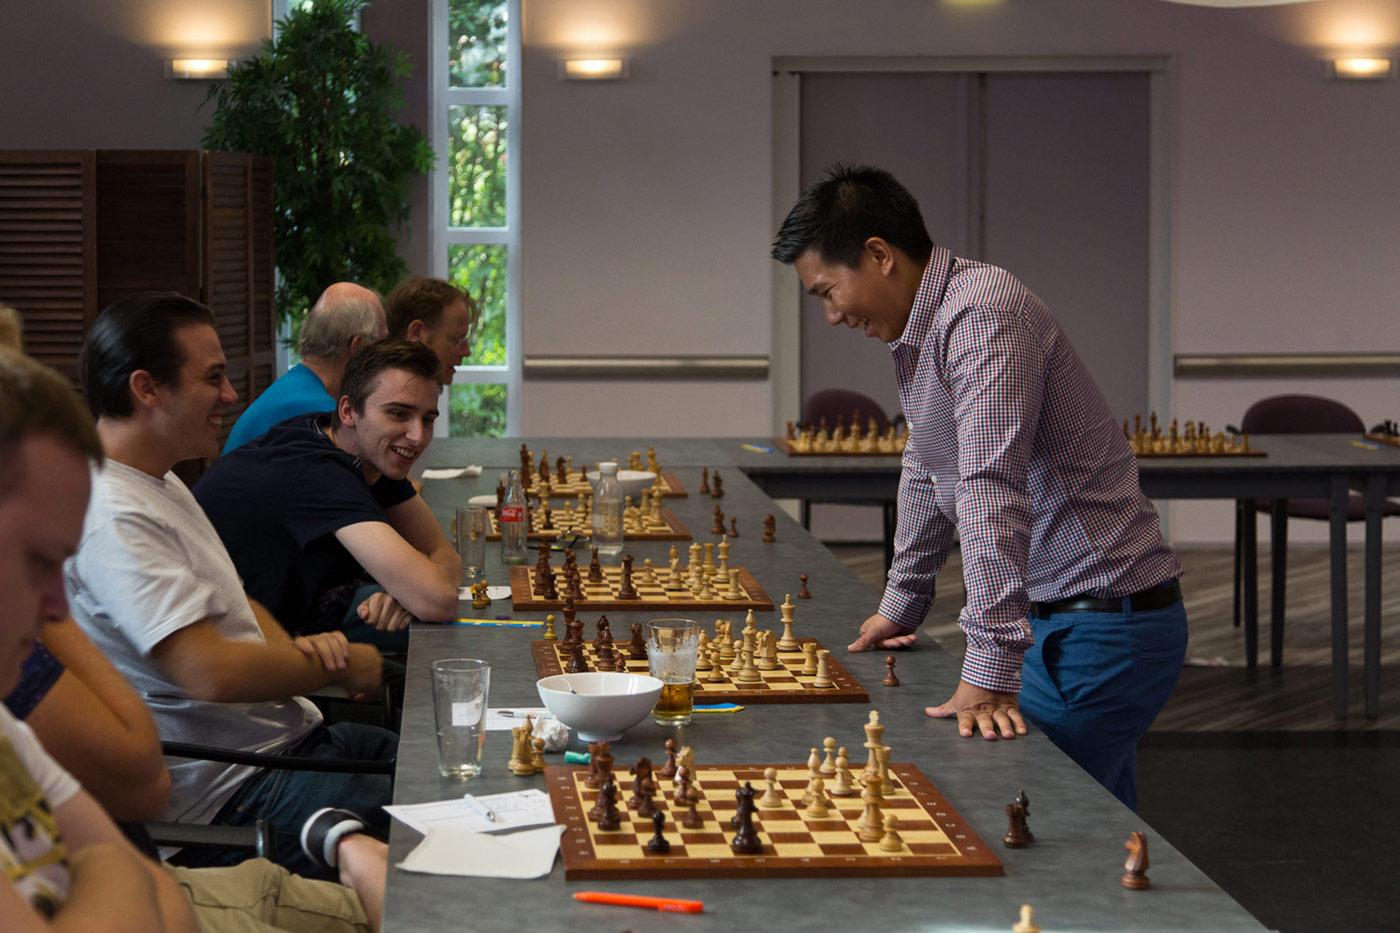 _h0a1402-matthew-tan-geeft-simultaan-bij-jubileumfeest-schaakvereniging-botwinnik-1400